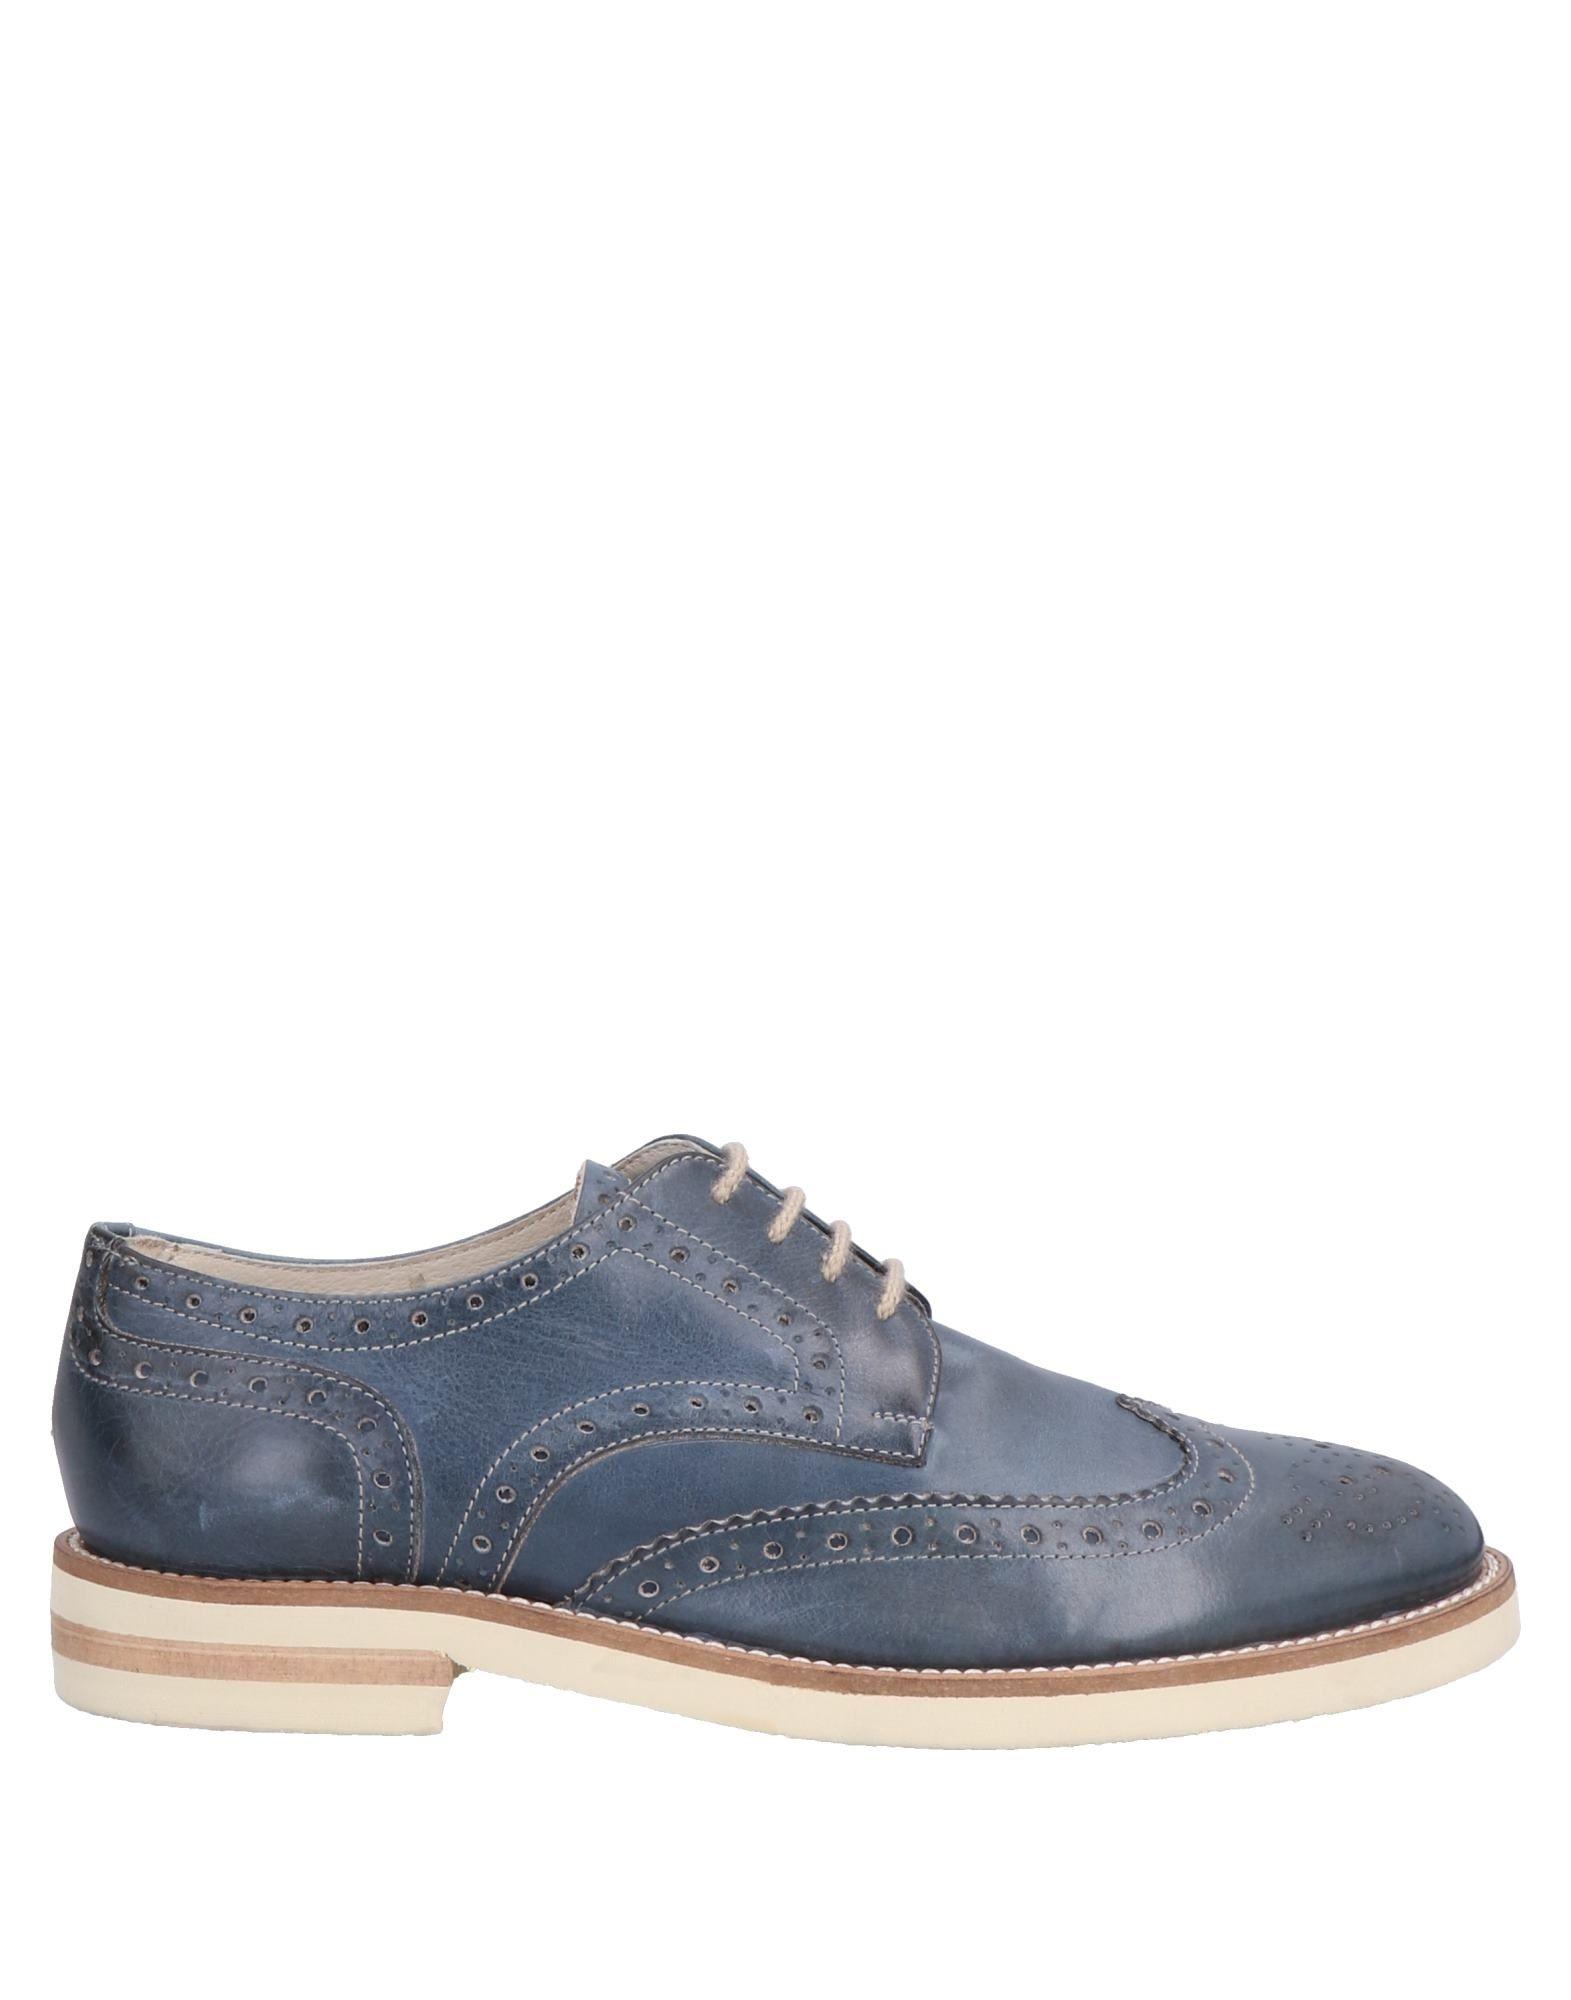 MAURO FERRINI Обувь на шнурках